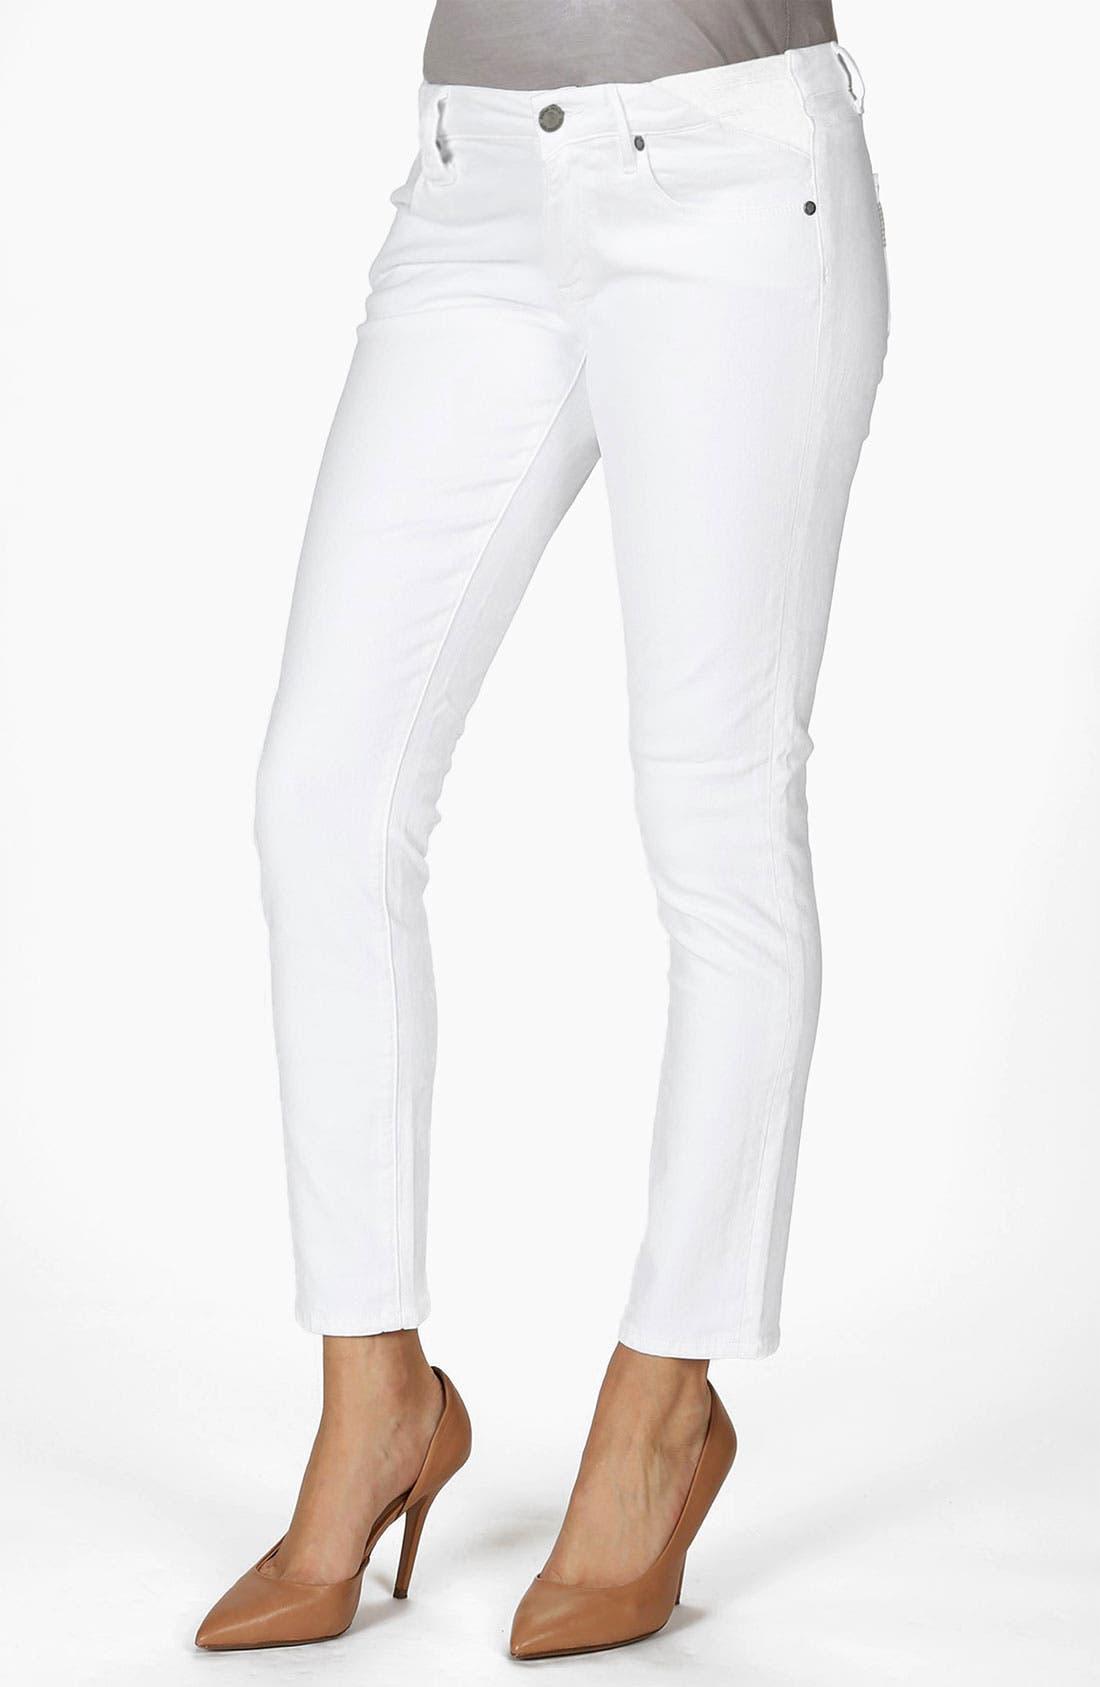 Alternate Image 1 Selected - Paige Denim 'Skyline' Maternity Ankle Skinny Stretch Jeans (Optic White)